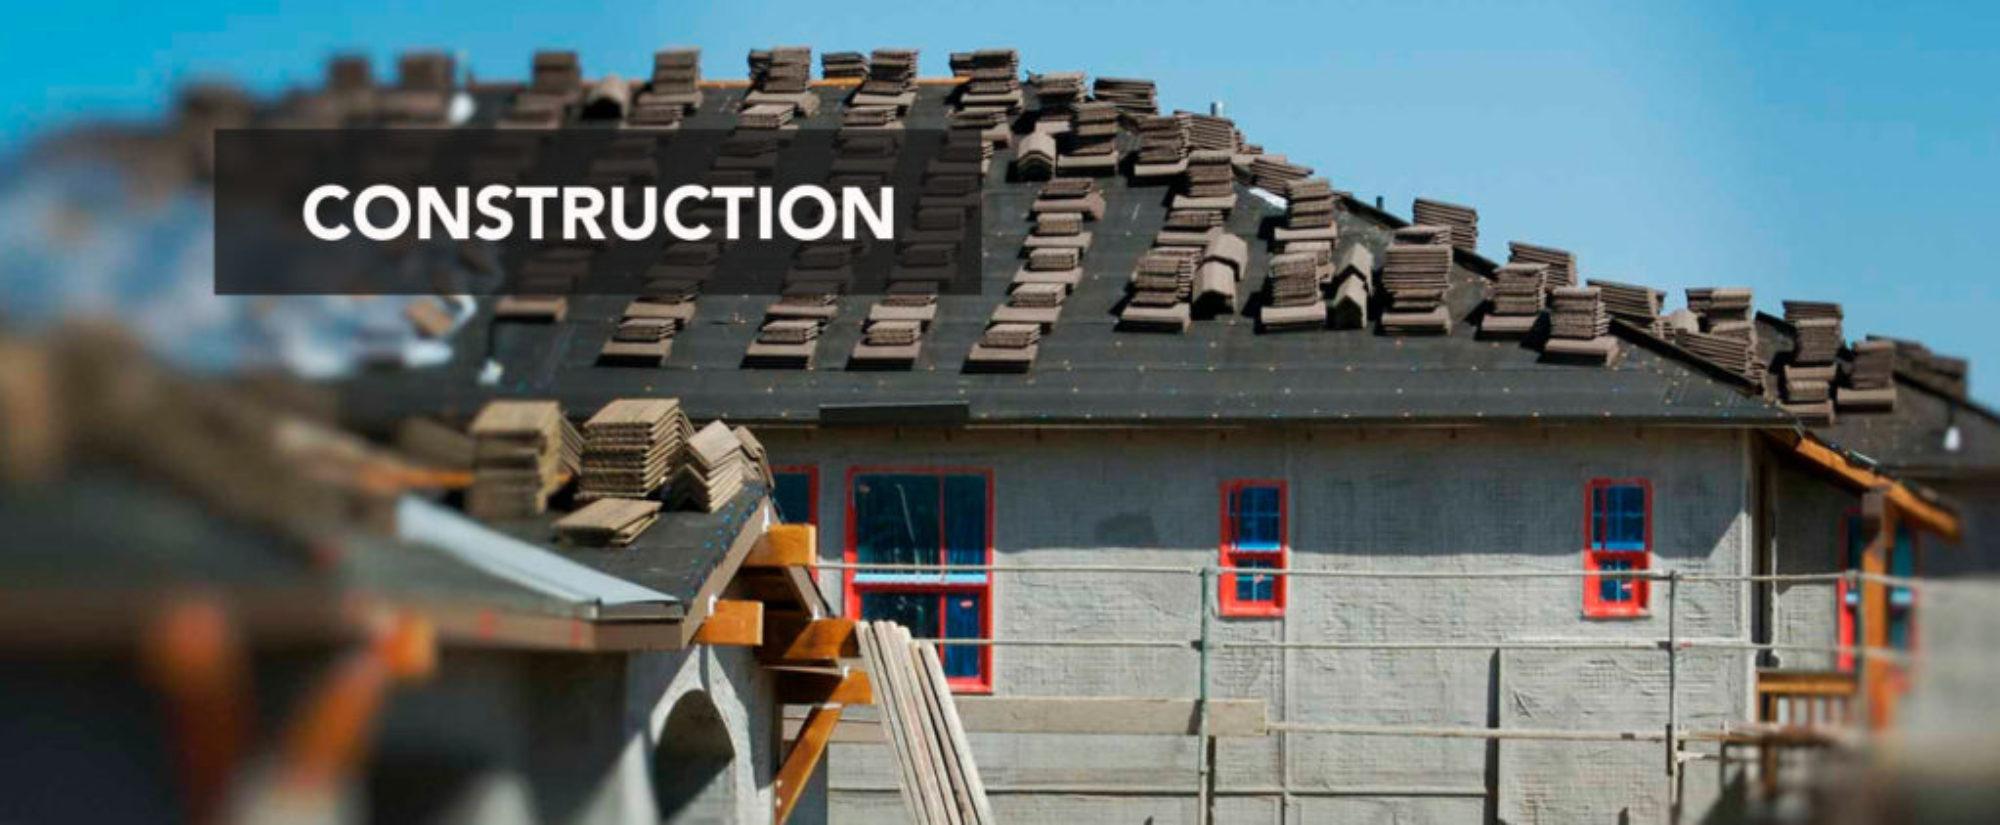 Construction-2019